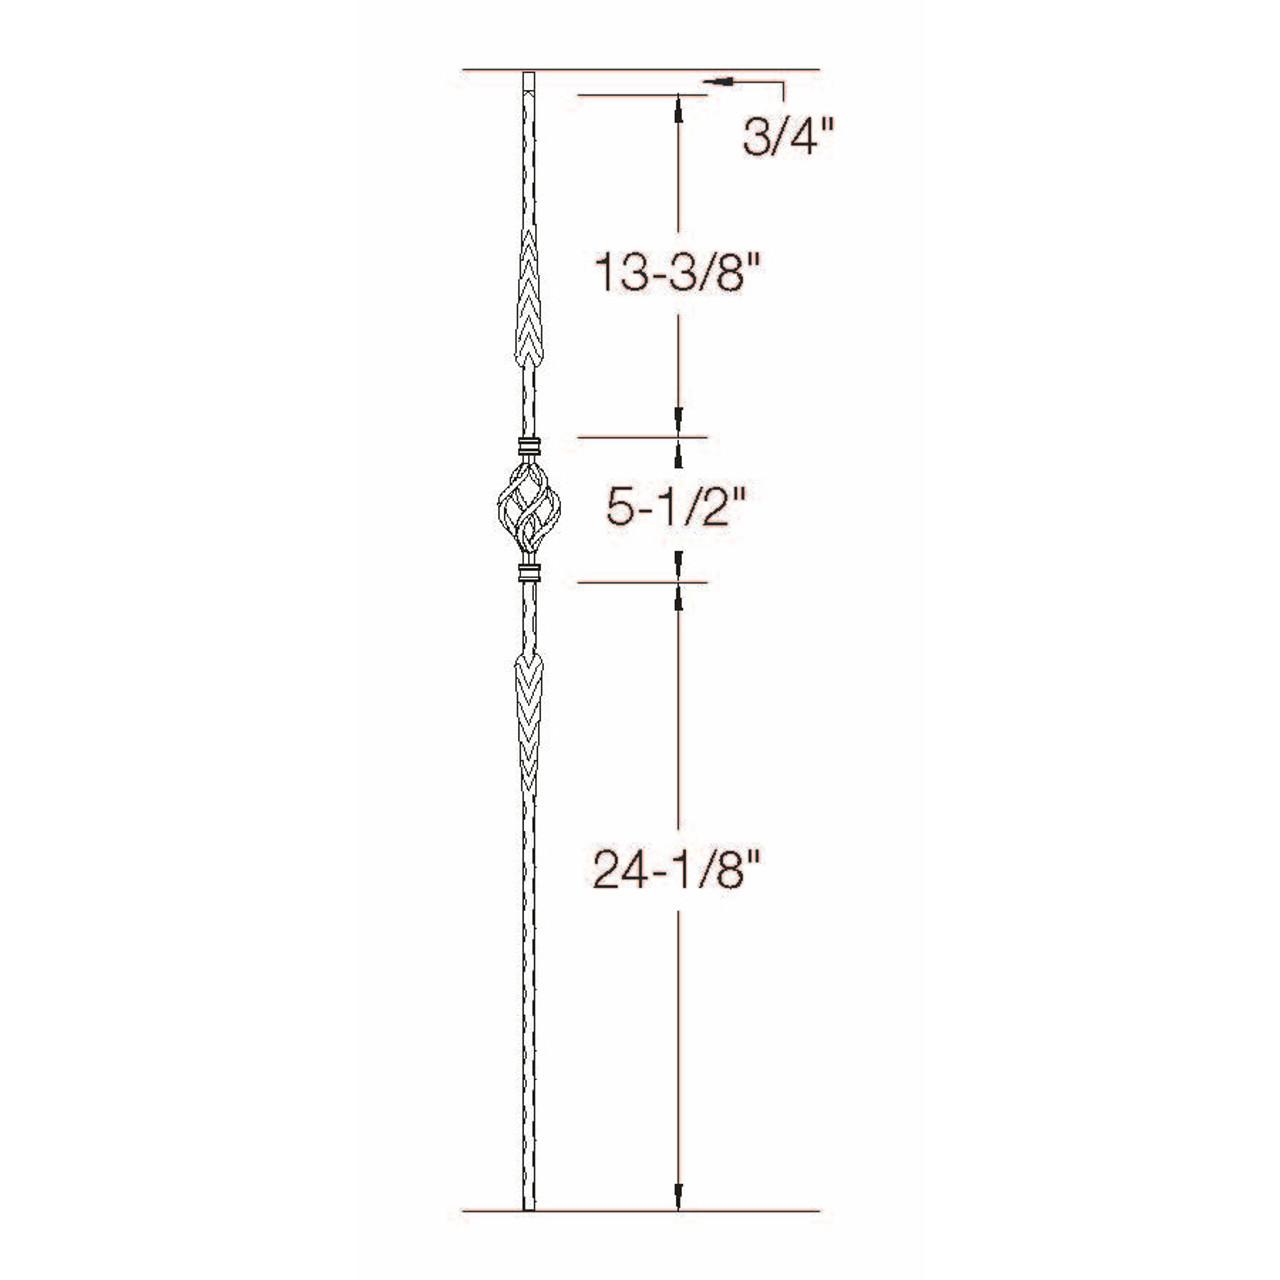 T-23 Split Double Arrows with Basket Edge Hammered Tubular Steel Baluster Dimensional Information